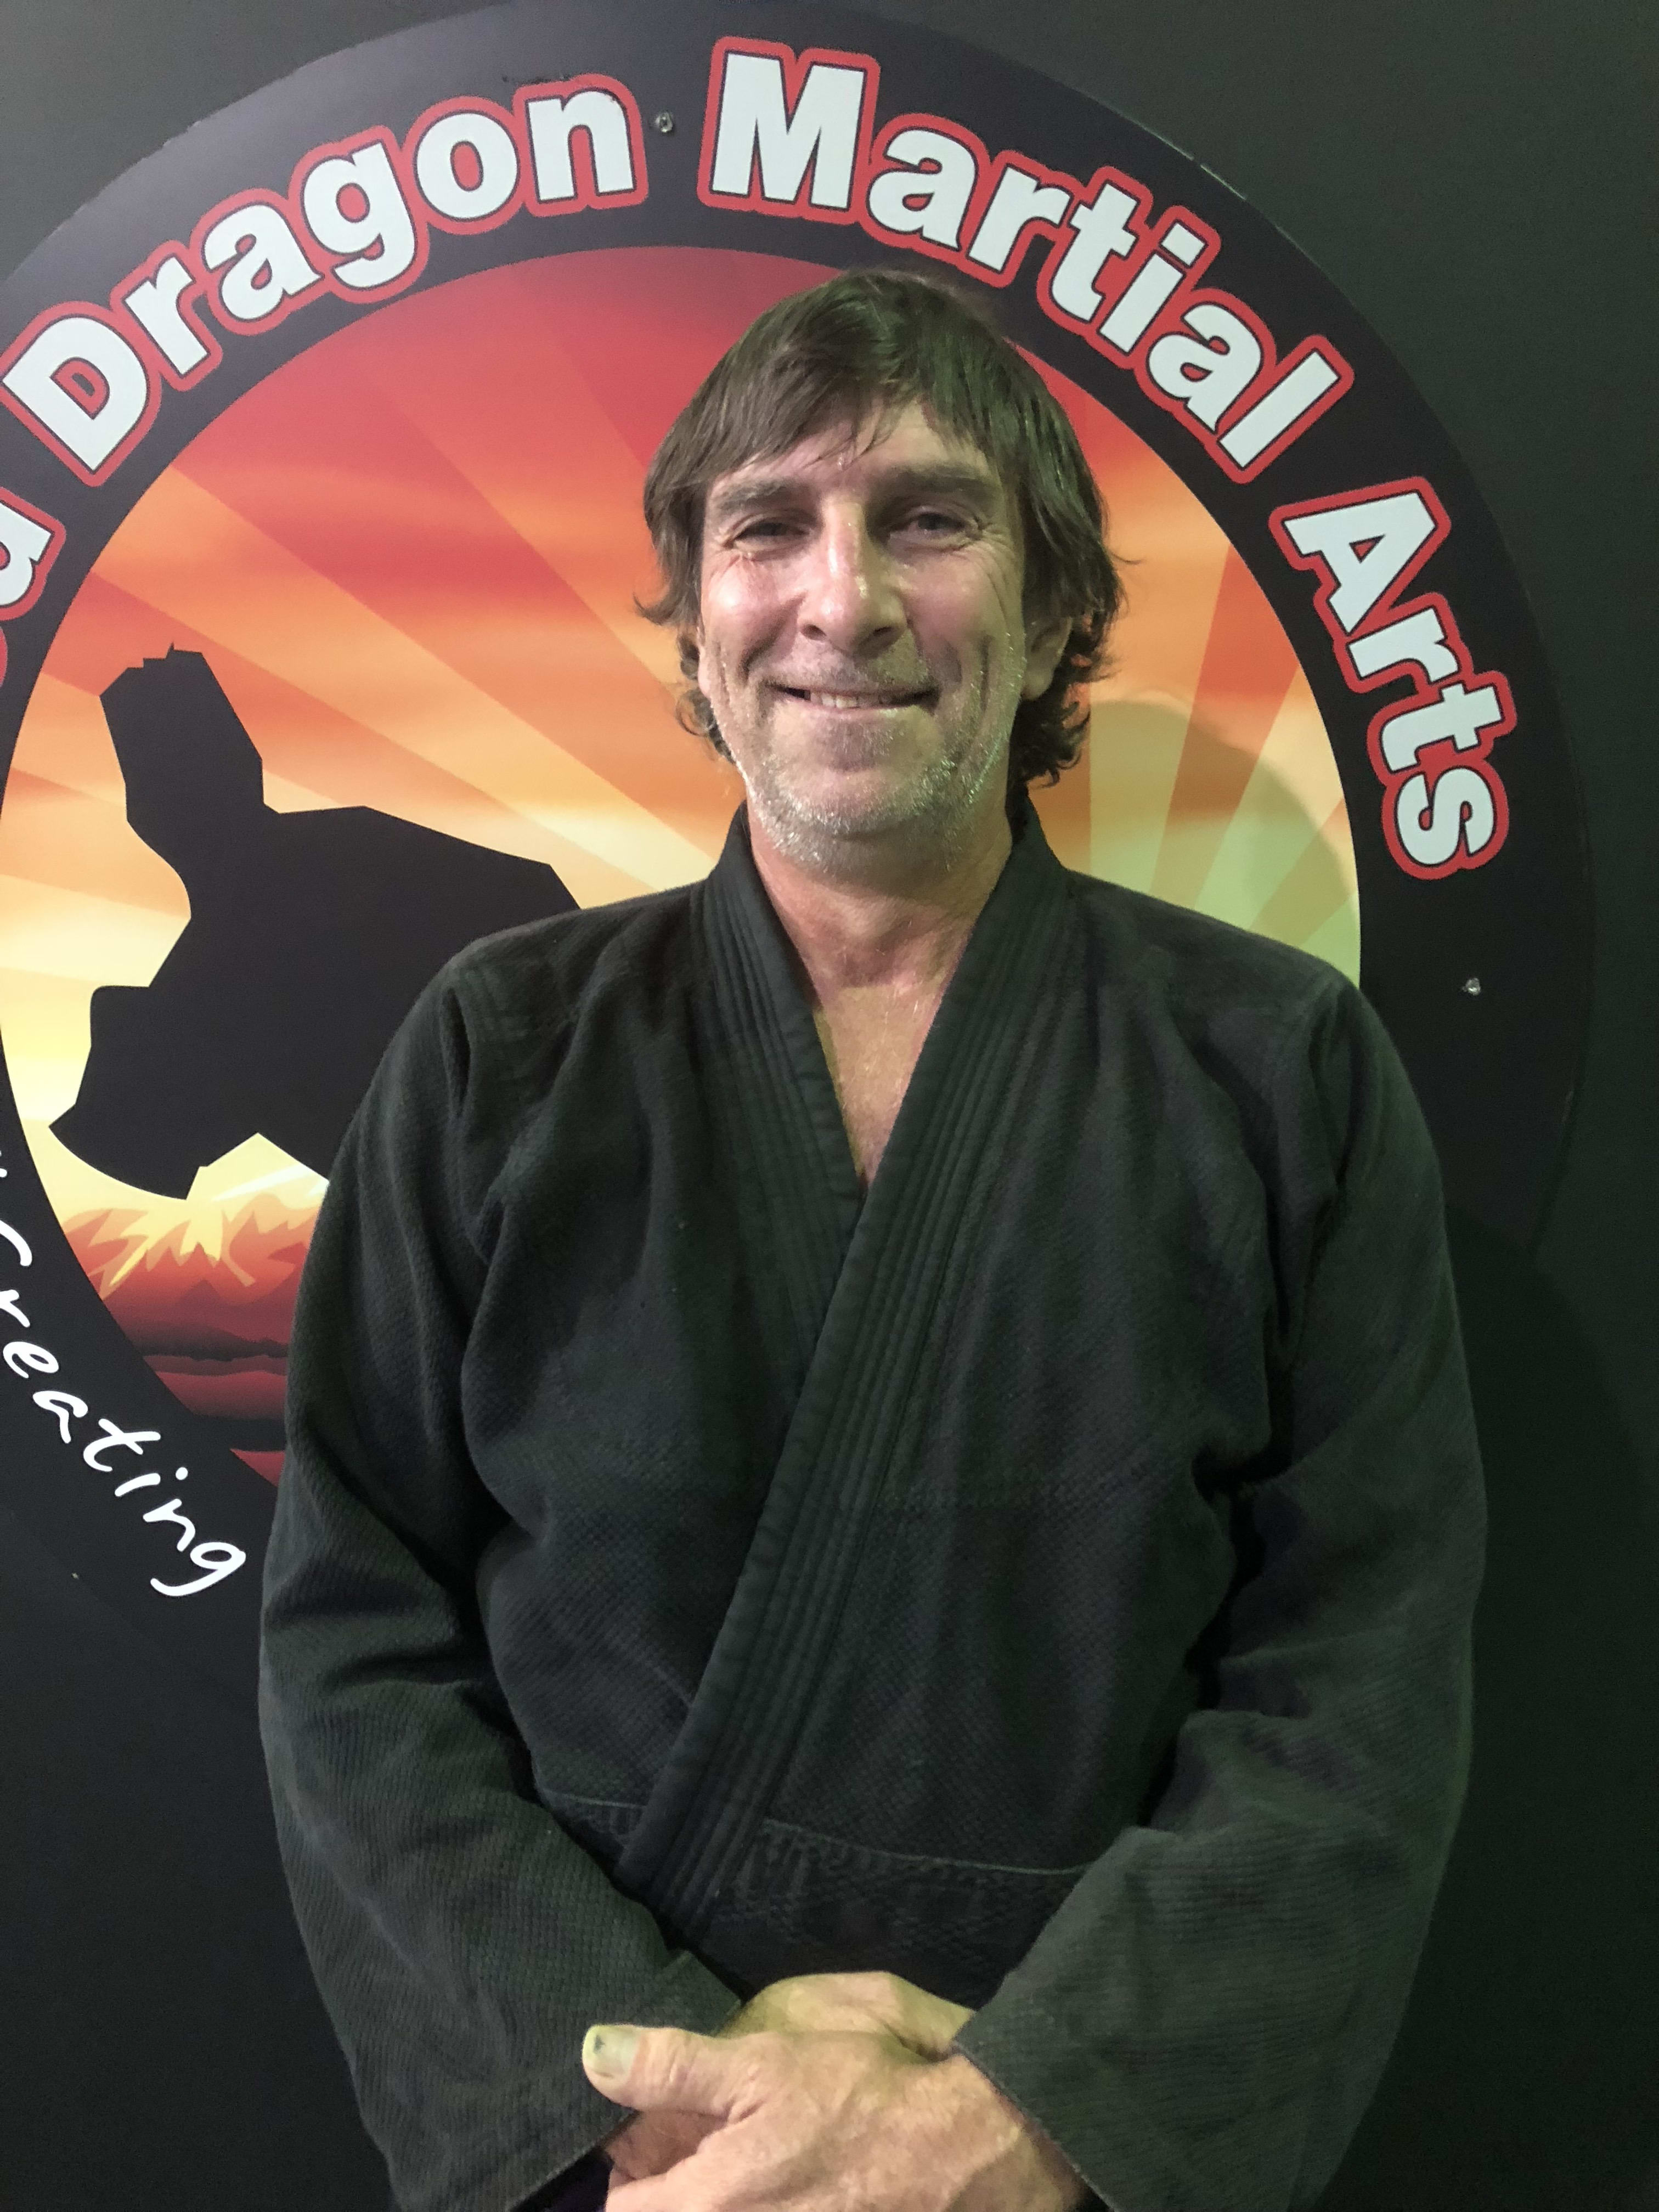 Paul Jones in Caboolture - Red Dragon Martial Arts